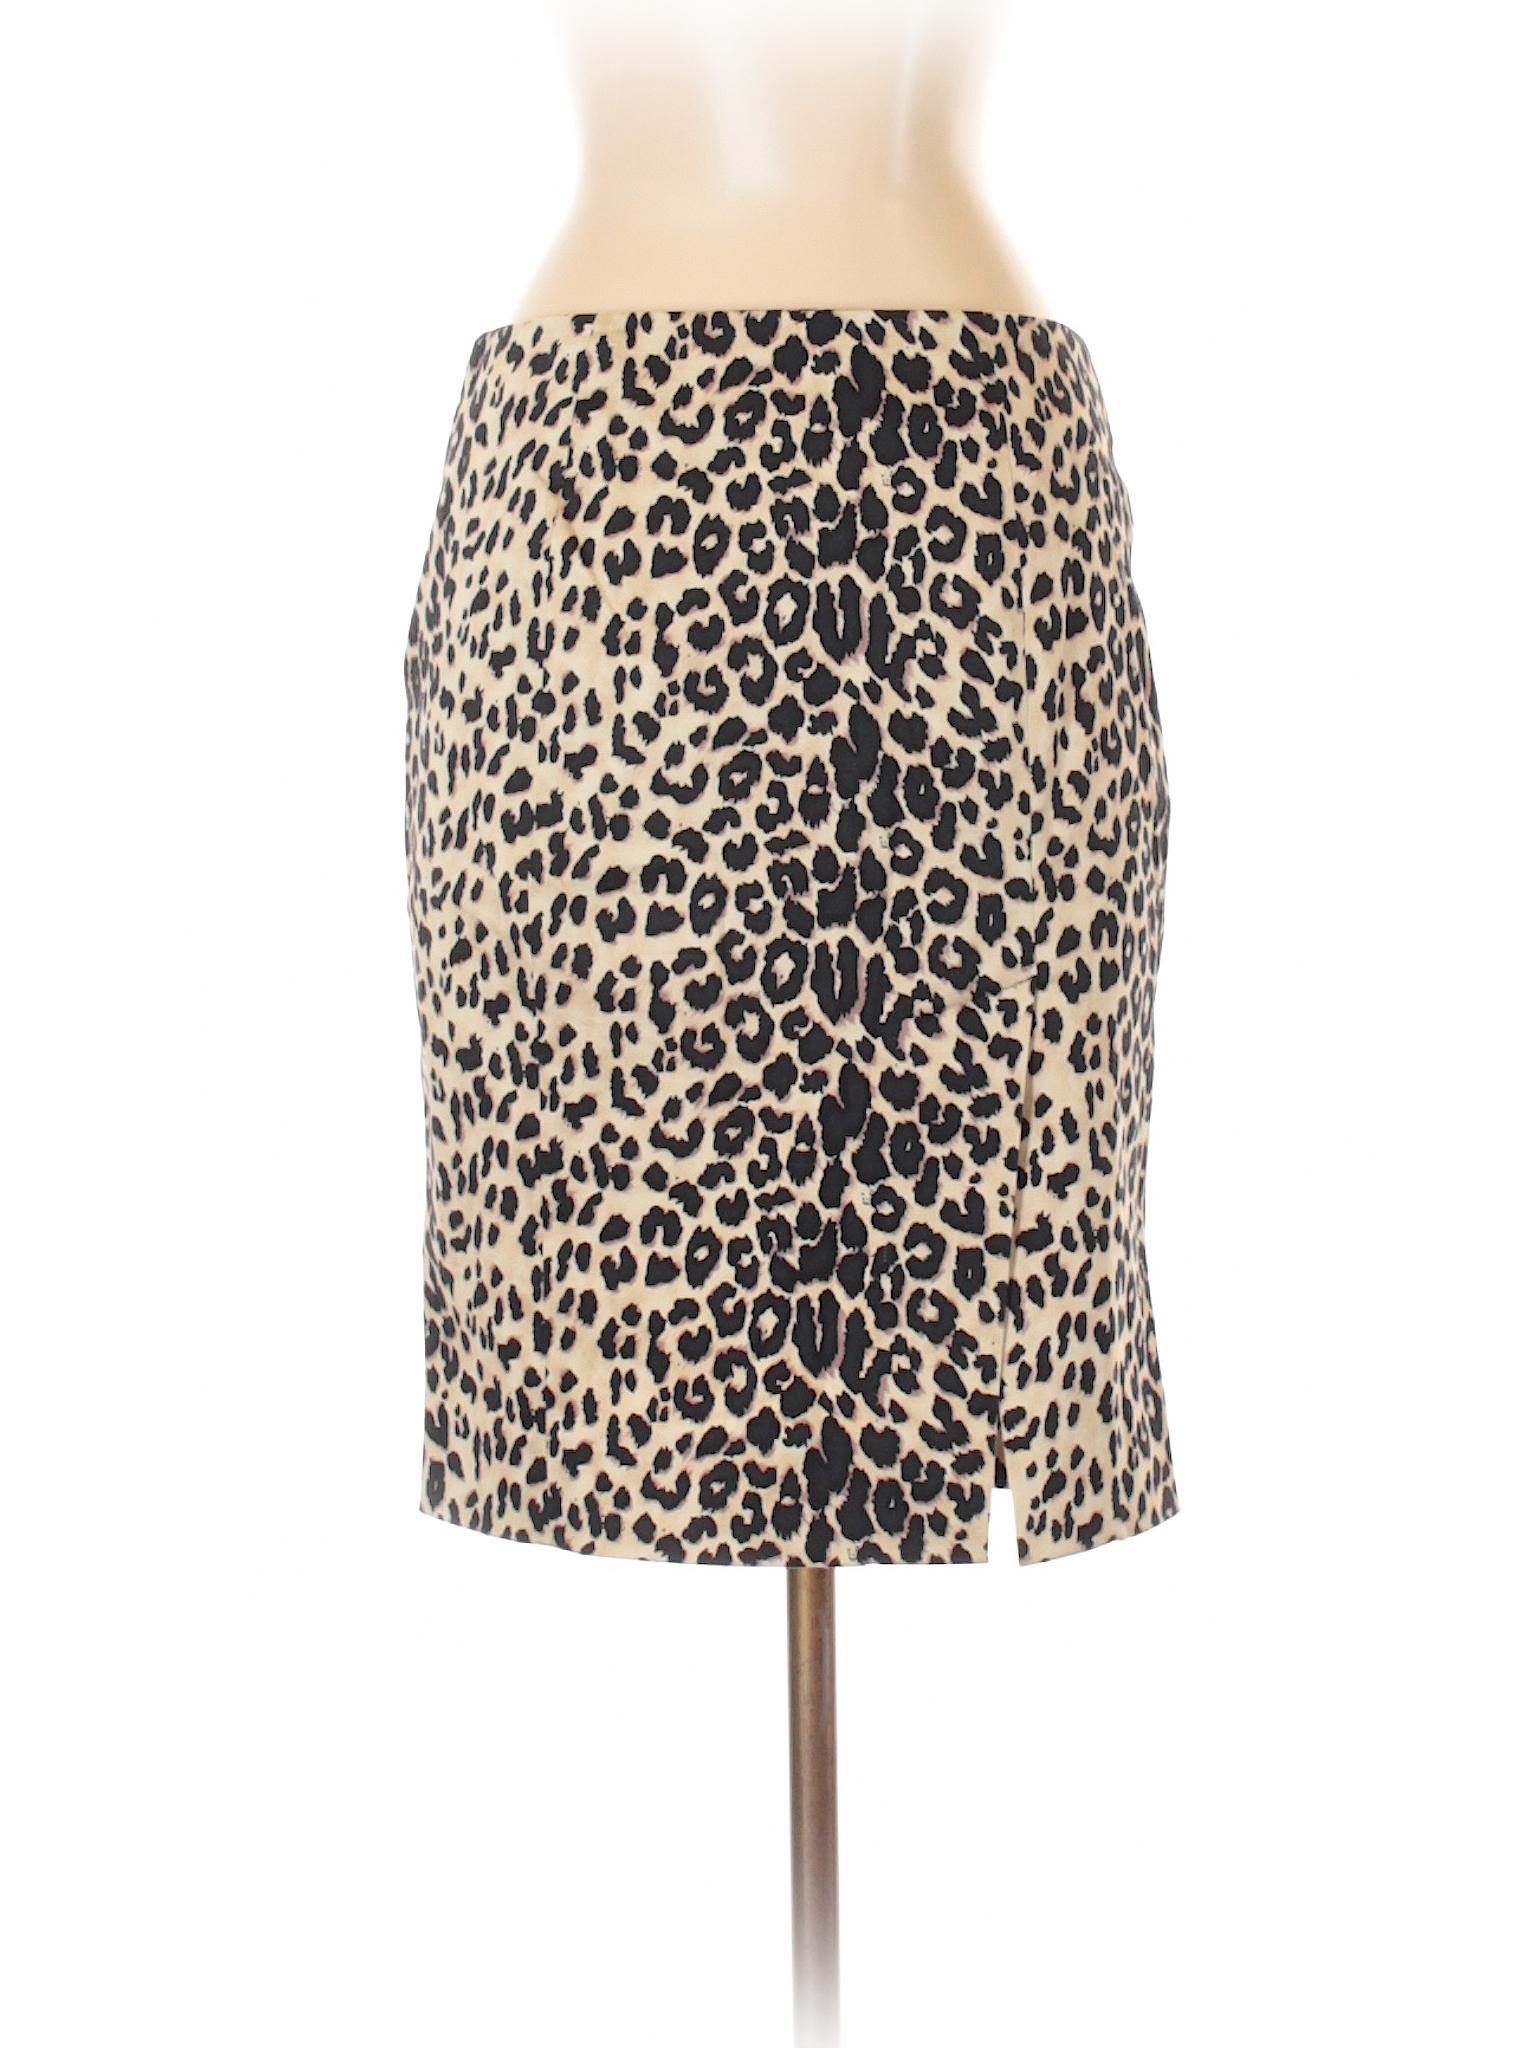 Skirt Casual Casual Casual Skirt Skirt Boutique Casual Boutique Boutique Boutique Skirt 1vAOqppnx